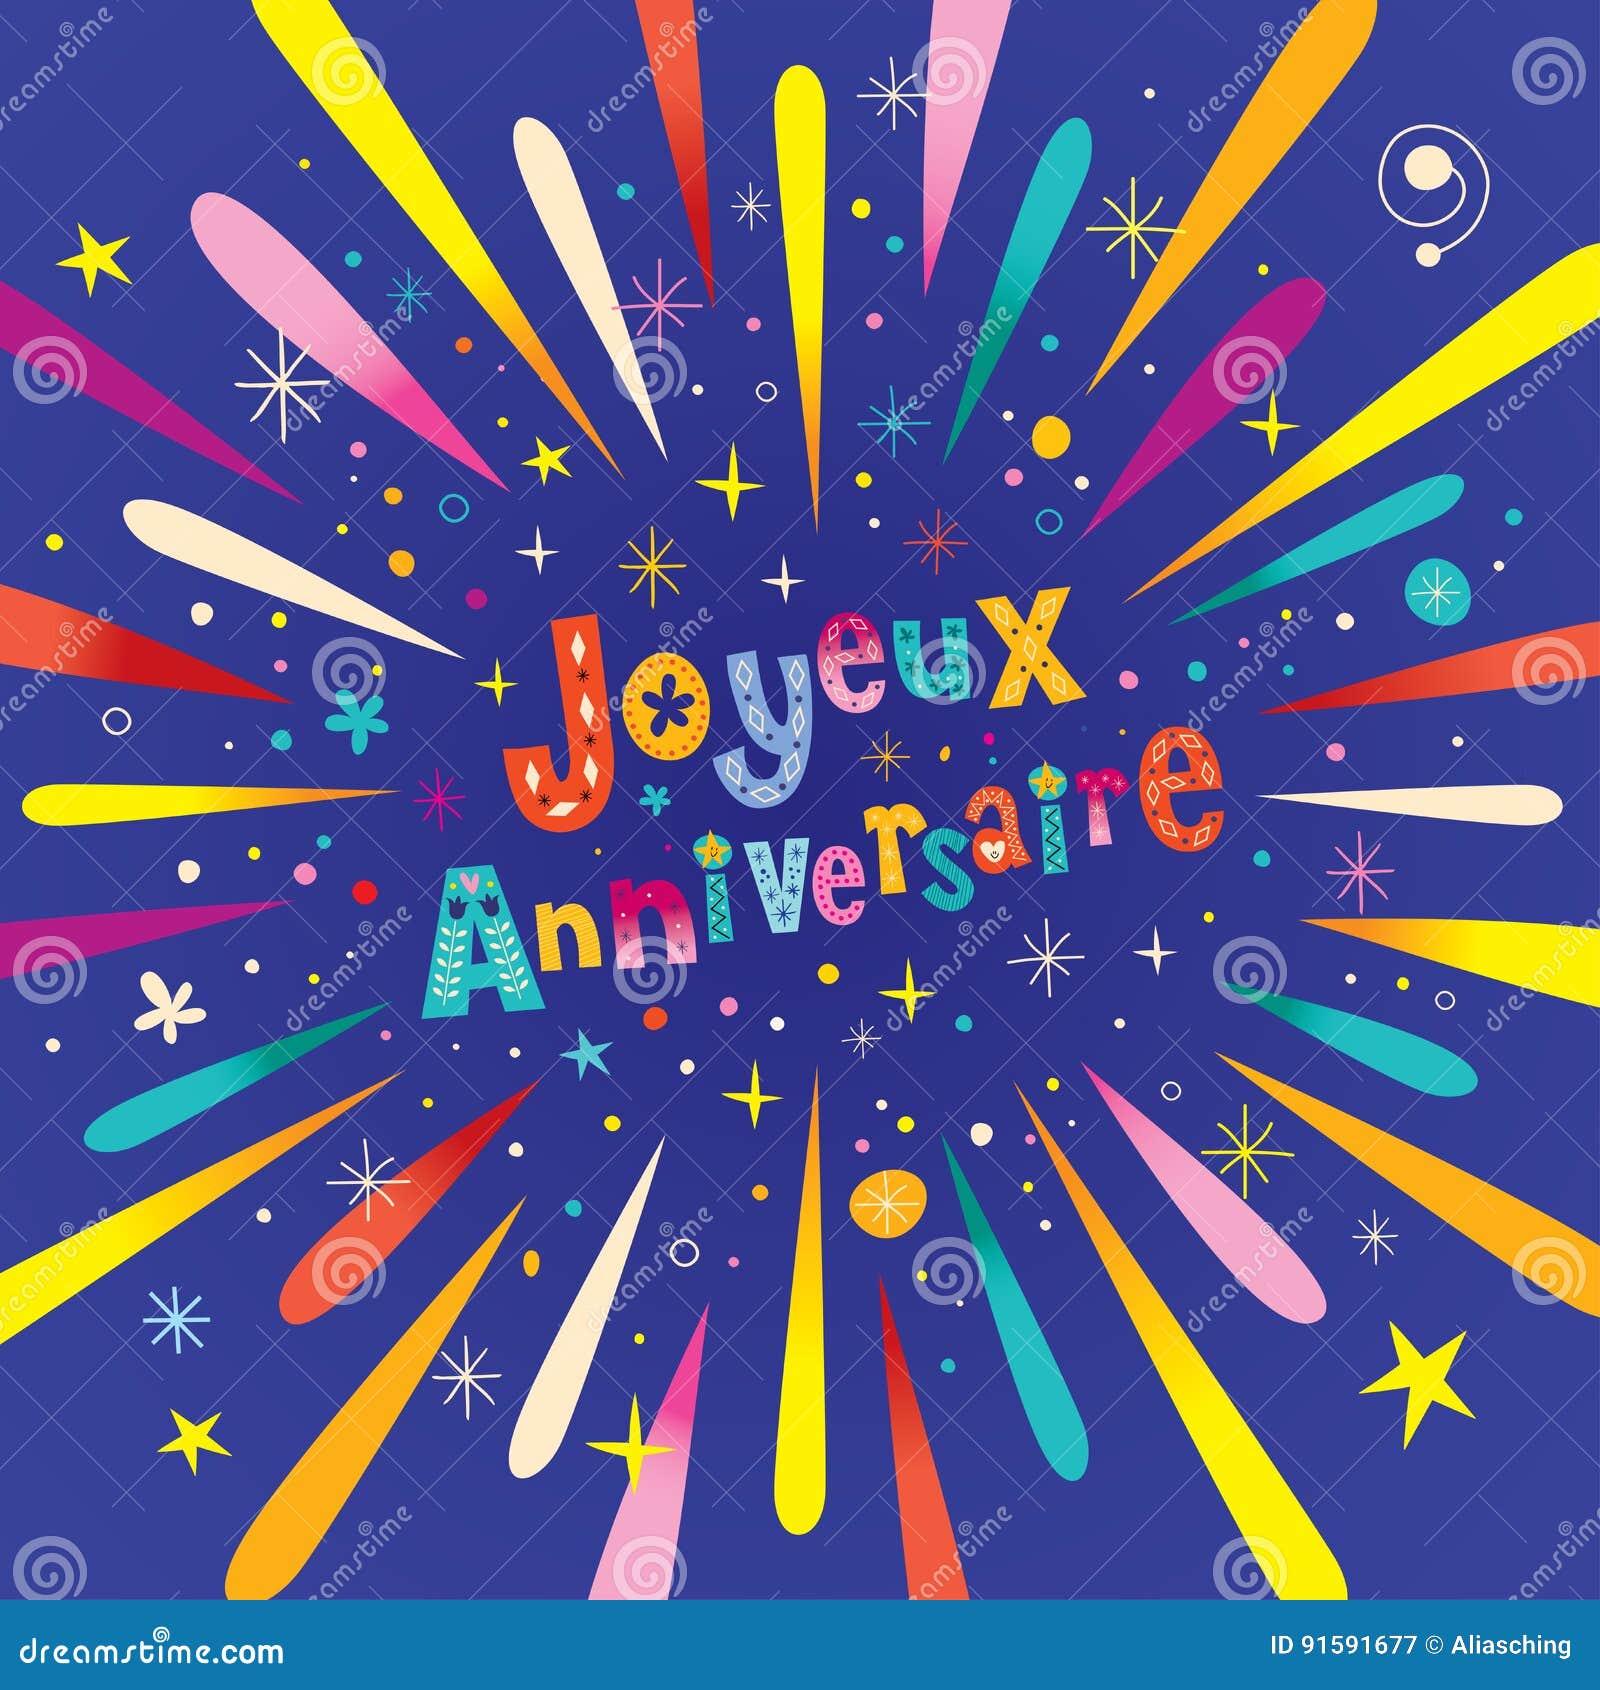 Joyeux Anniversaire Happy Birthday In French Greeting Card